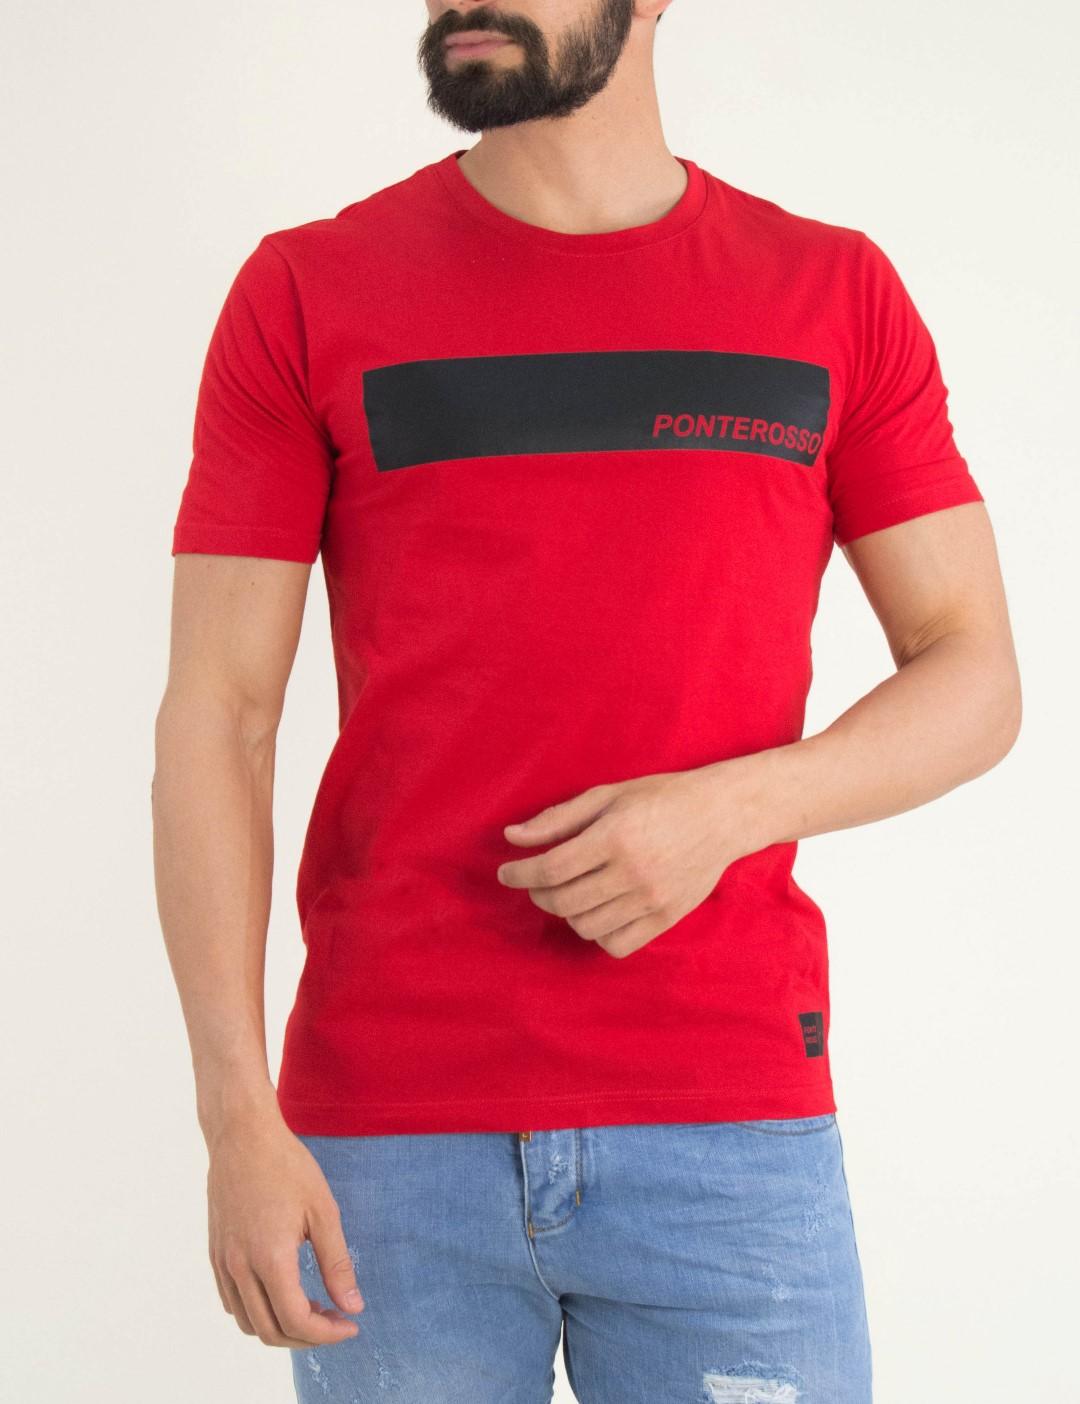 30786542bc24 Ανδρικό κόκκινο Tshirt στάμπα Ponte rosso 191028